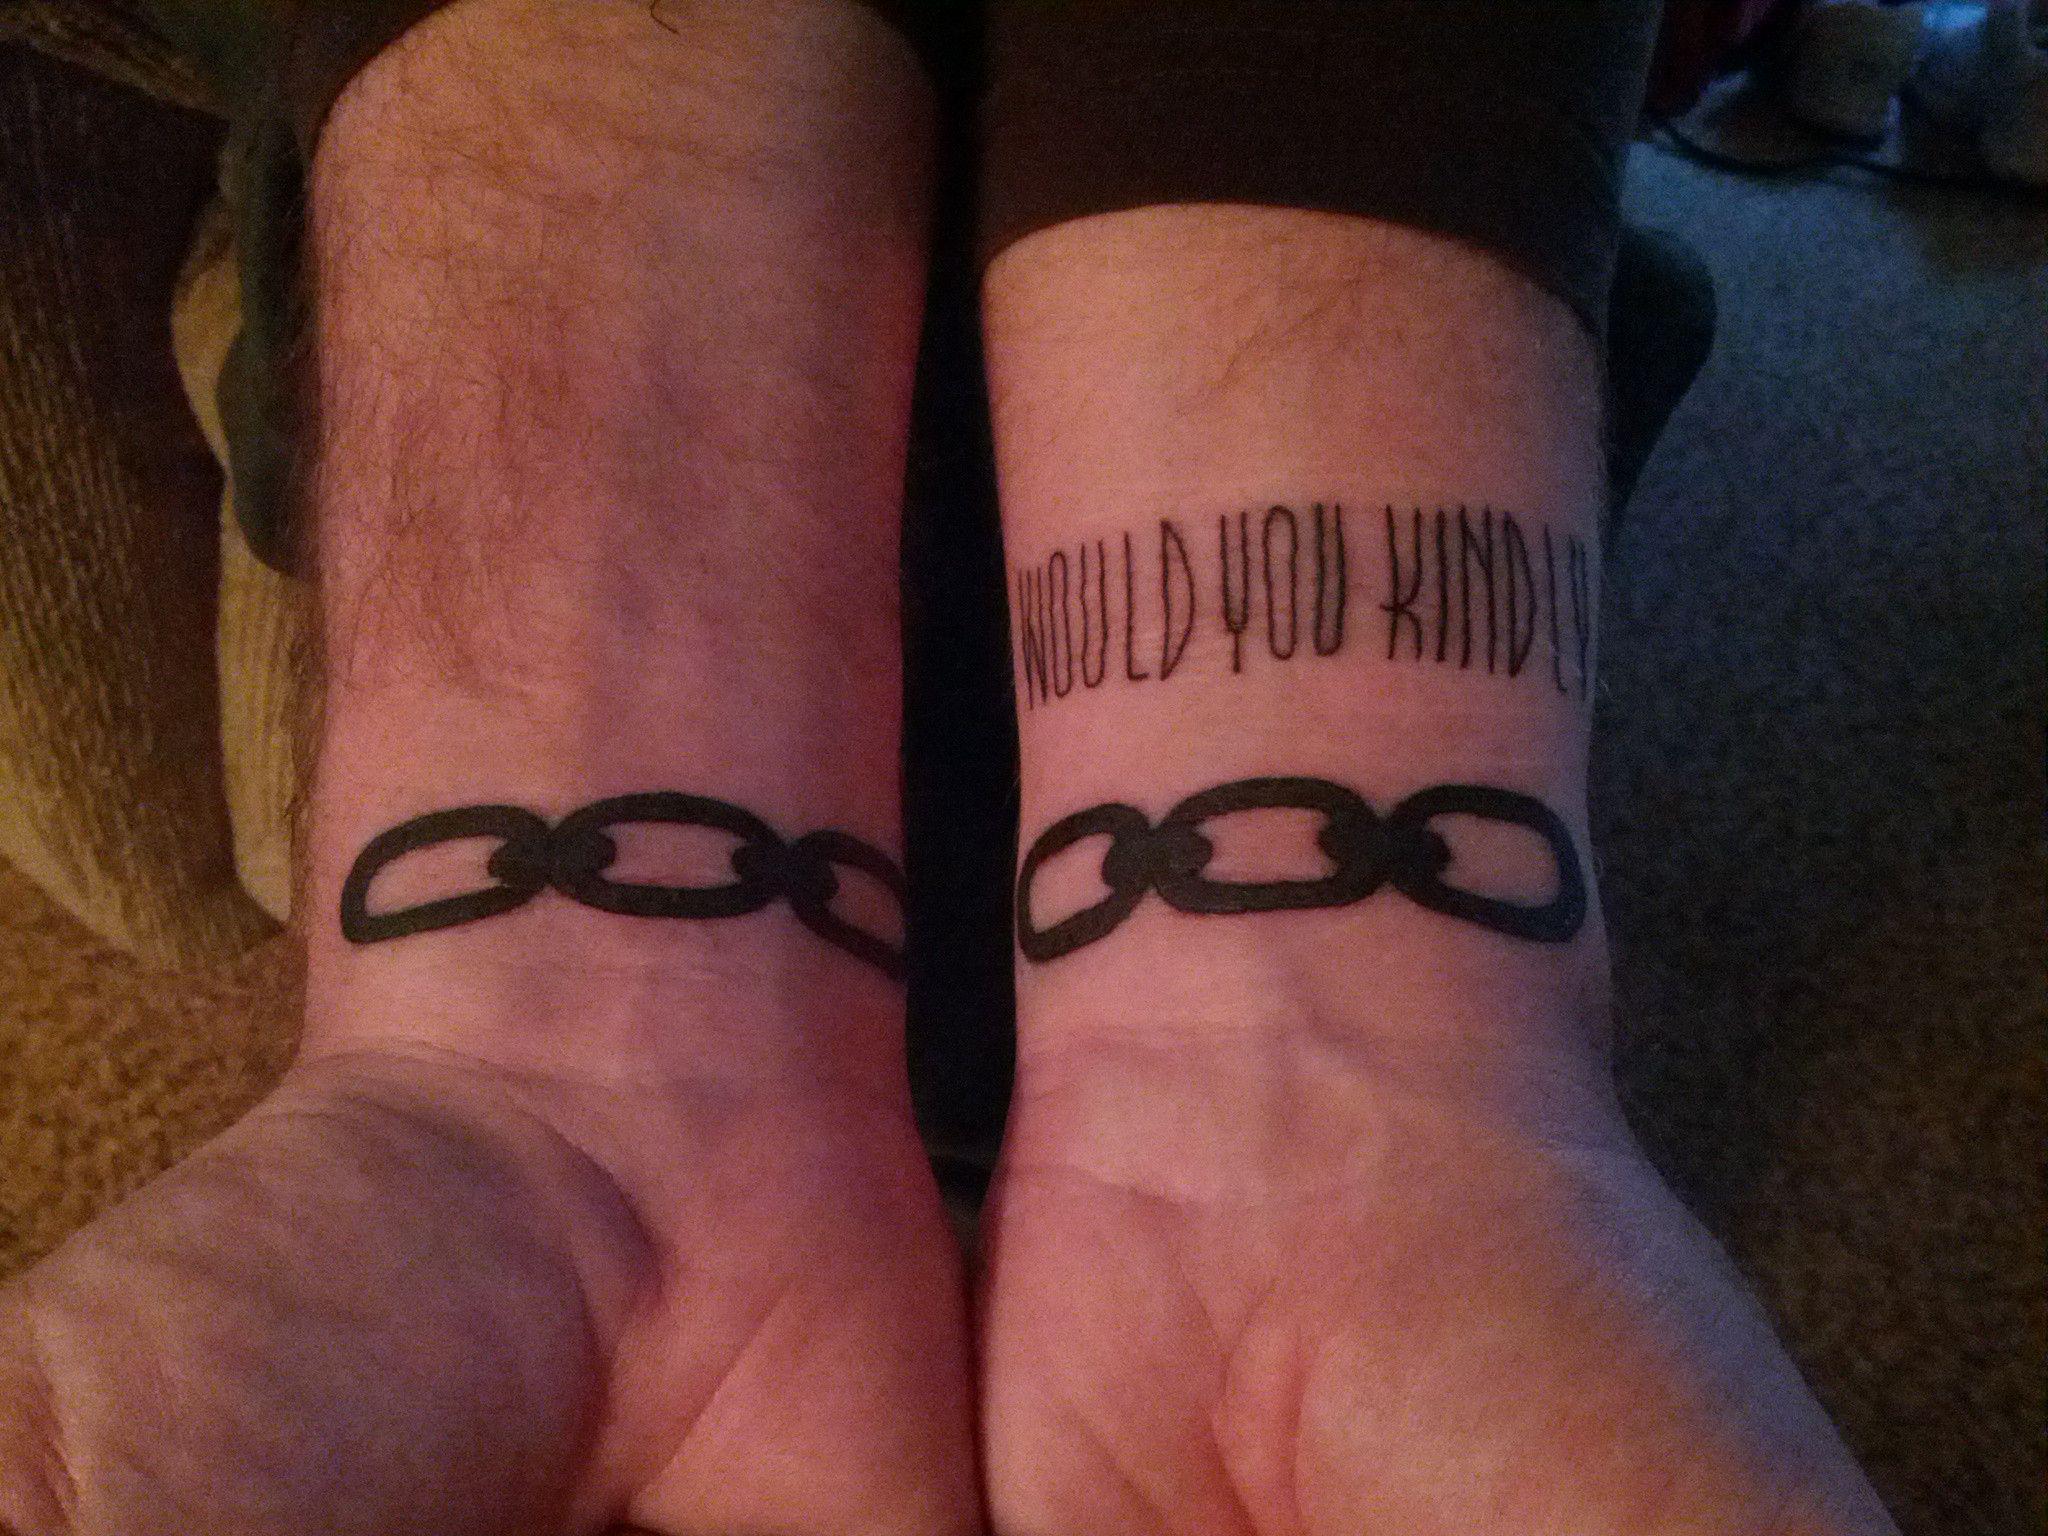 Bioshock tattoo would you kindly for Bioshock wrist tattoo